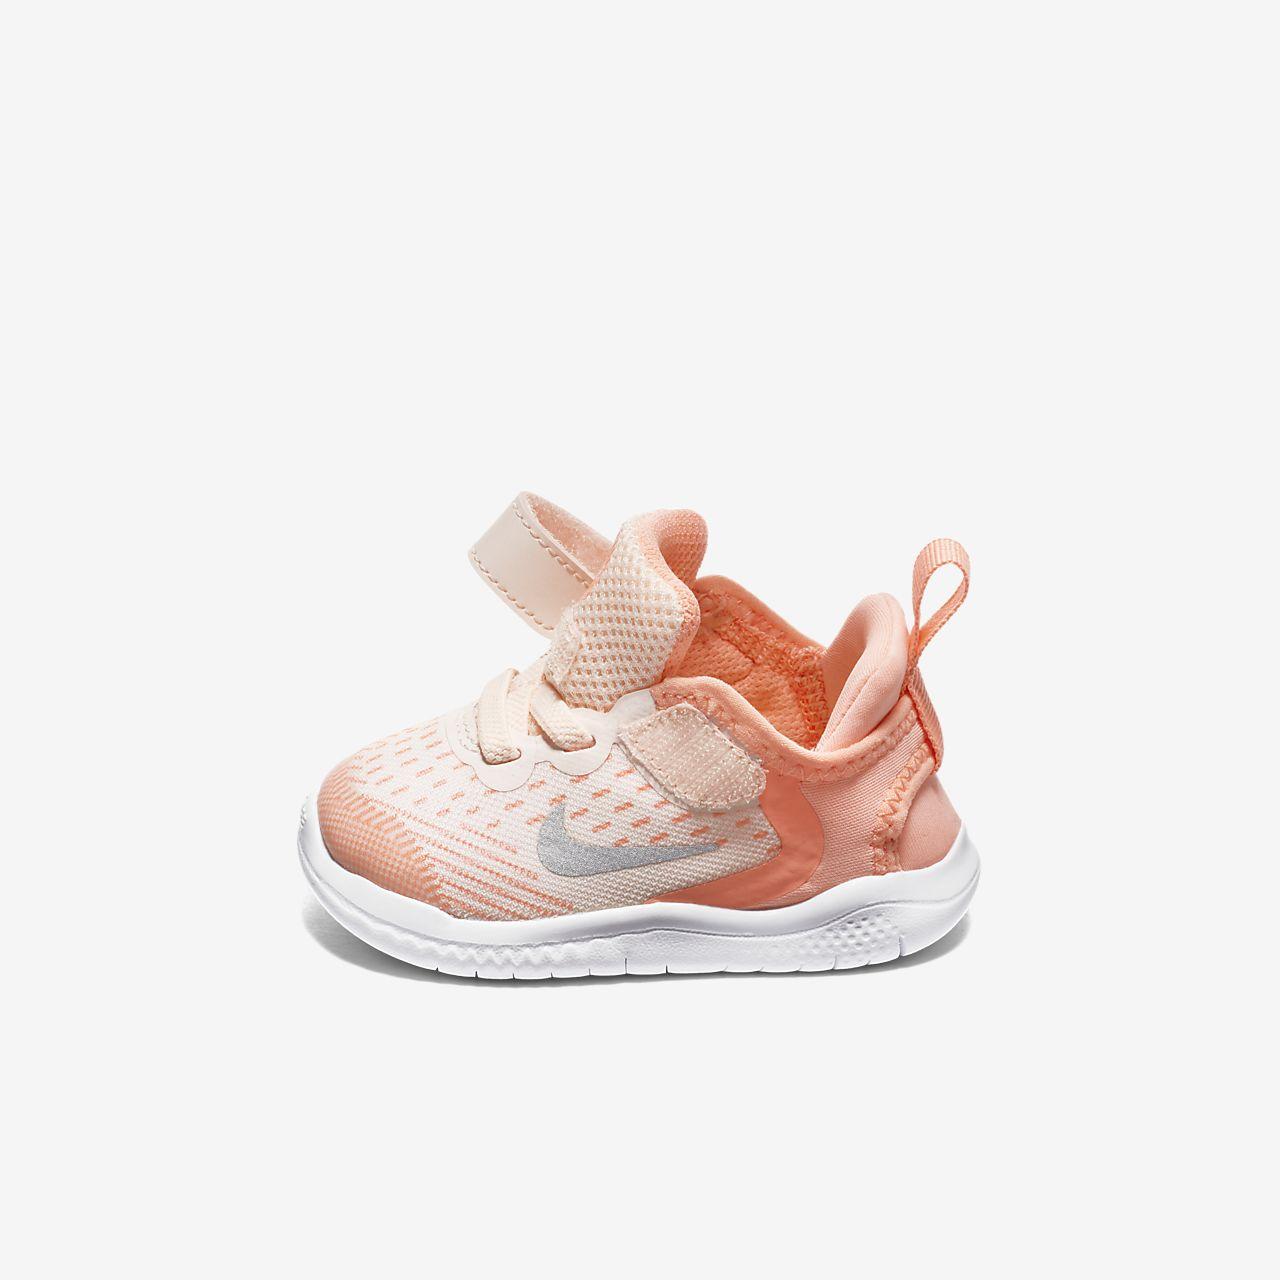 the latest 31ed7 63e8e Nike Free RN 2018 Baby & Toddler Shoe